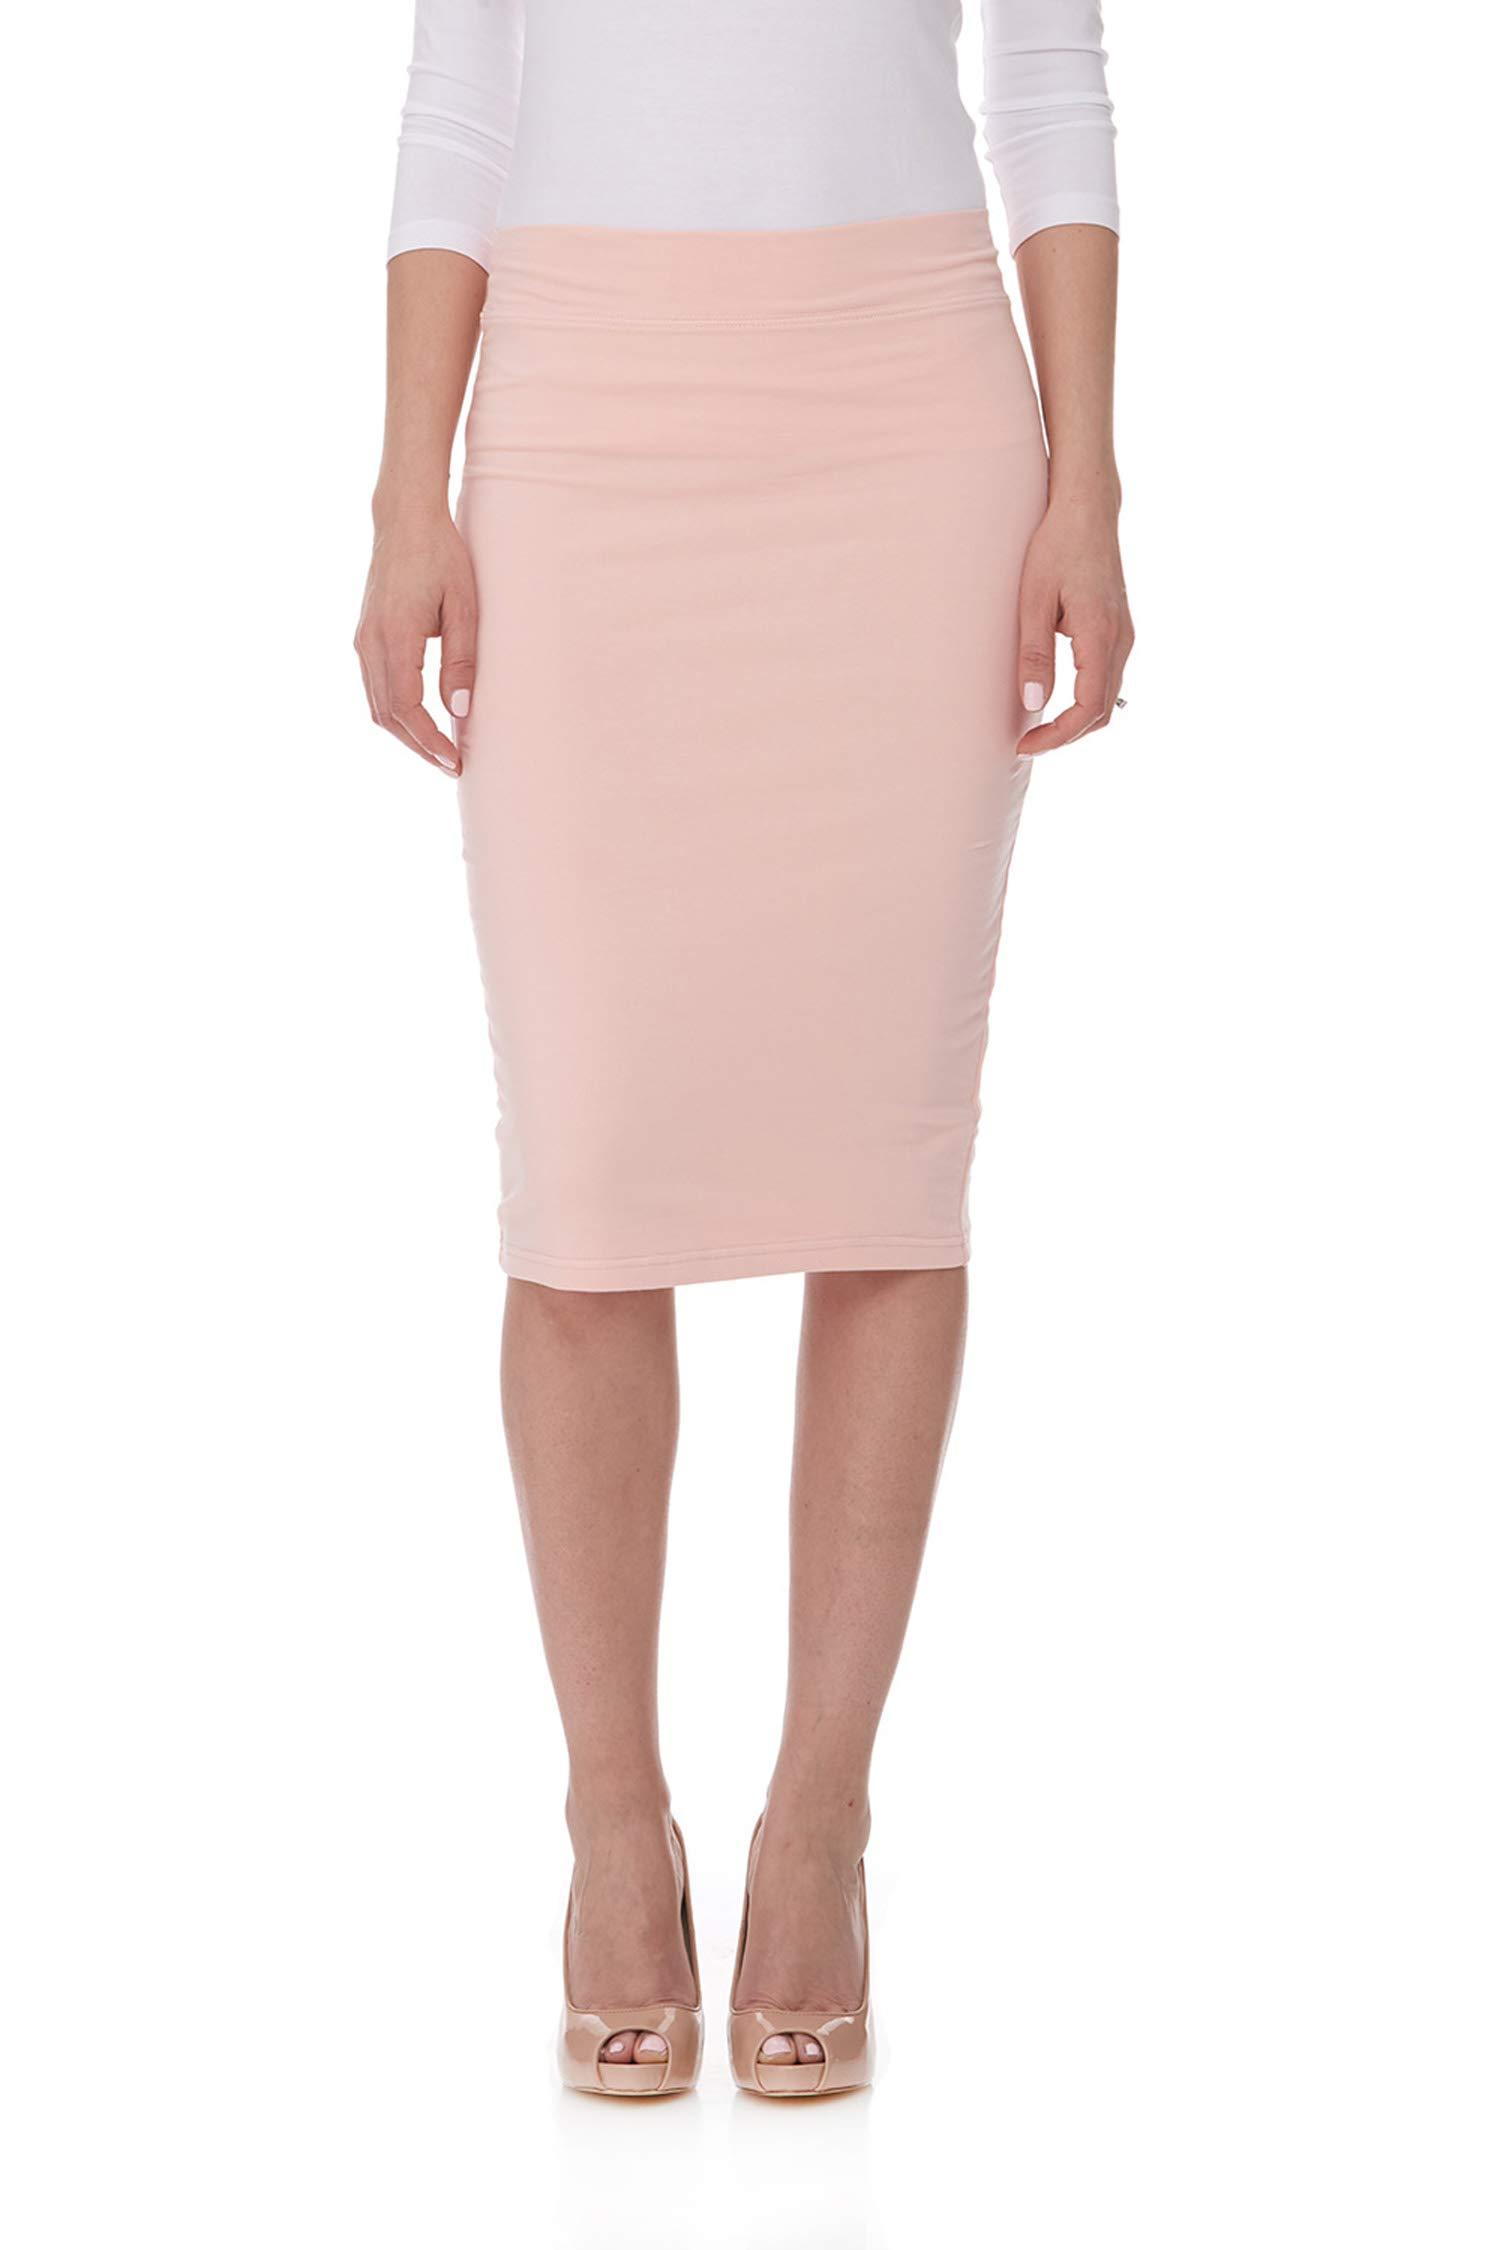 ESTEEZ Women's Cotton Pencil Skirt - Modest Below Knee Length- Opaque - Chicago